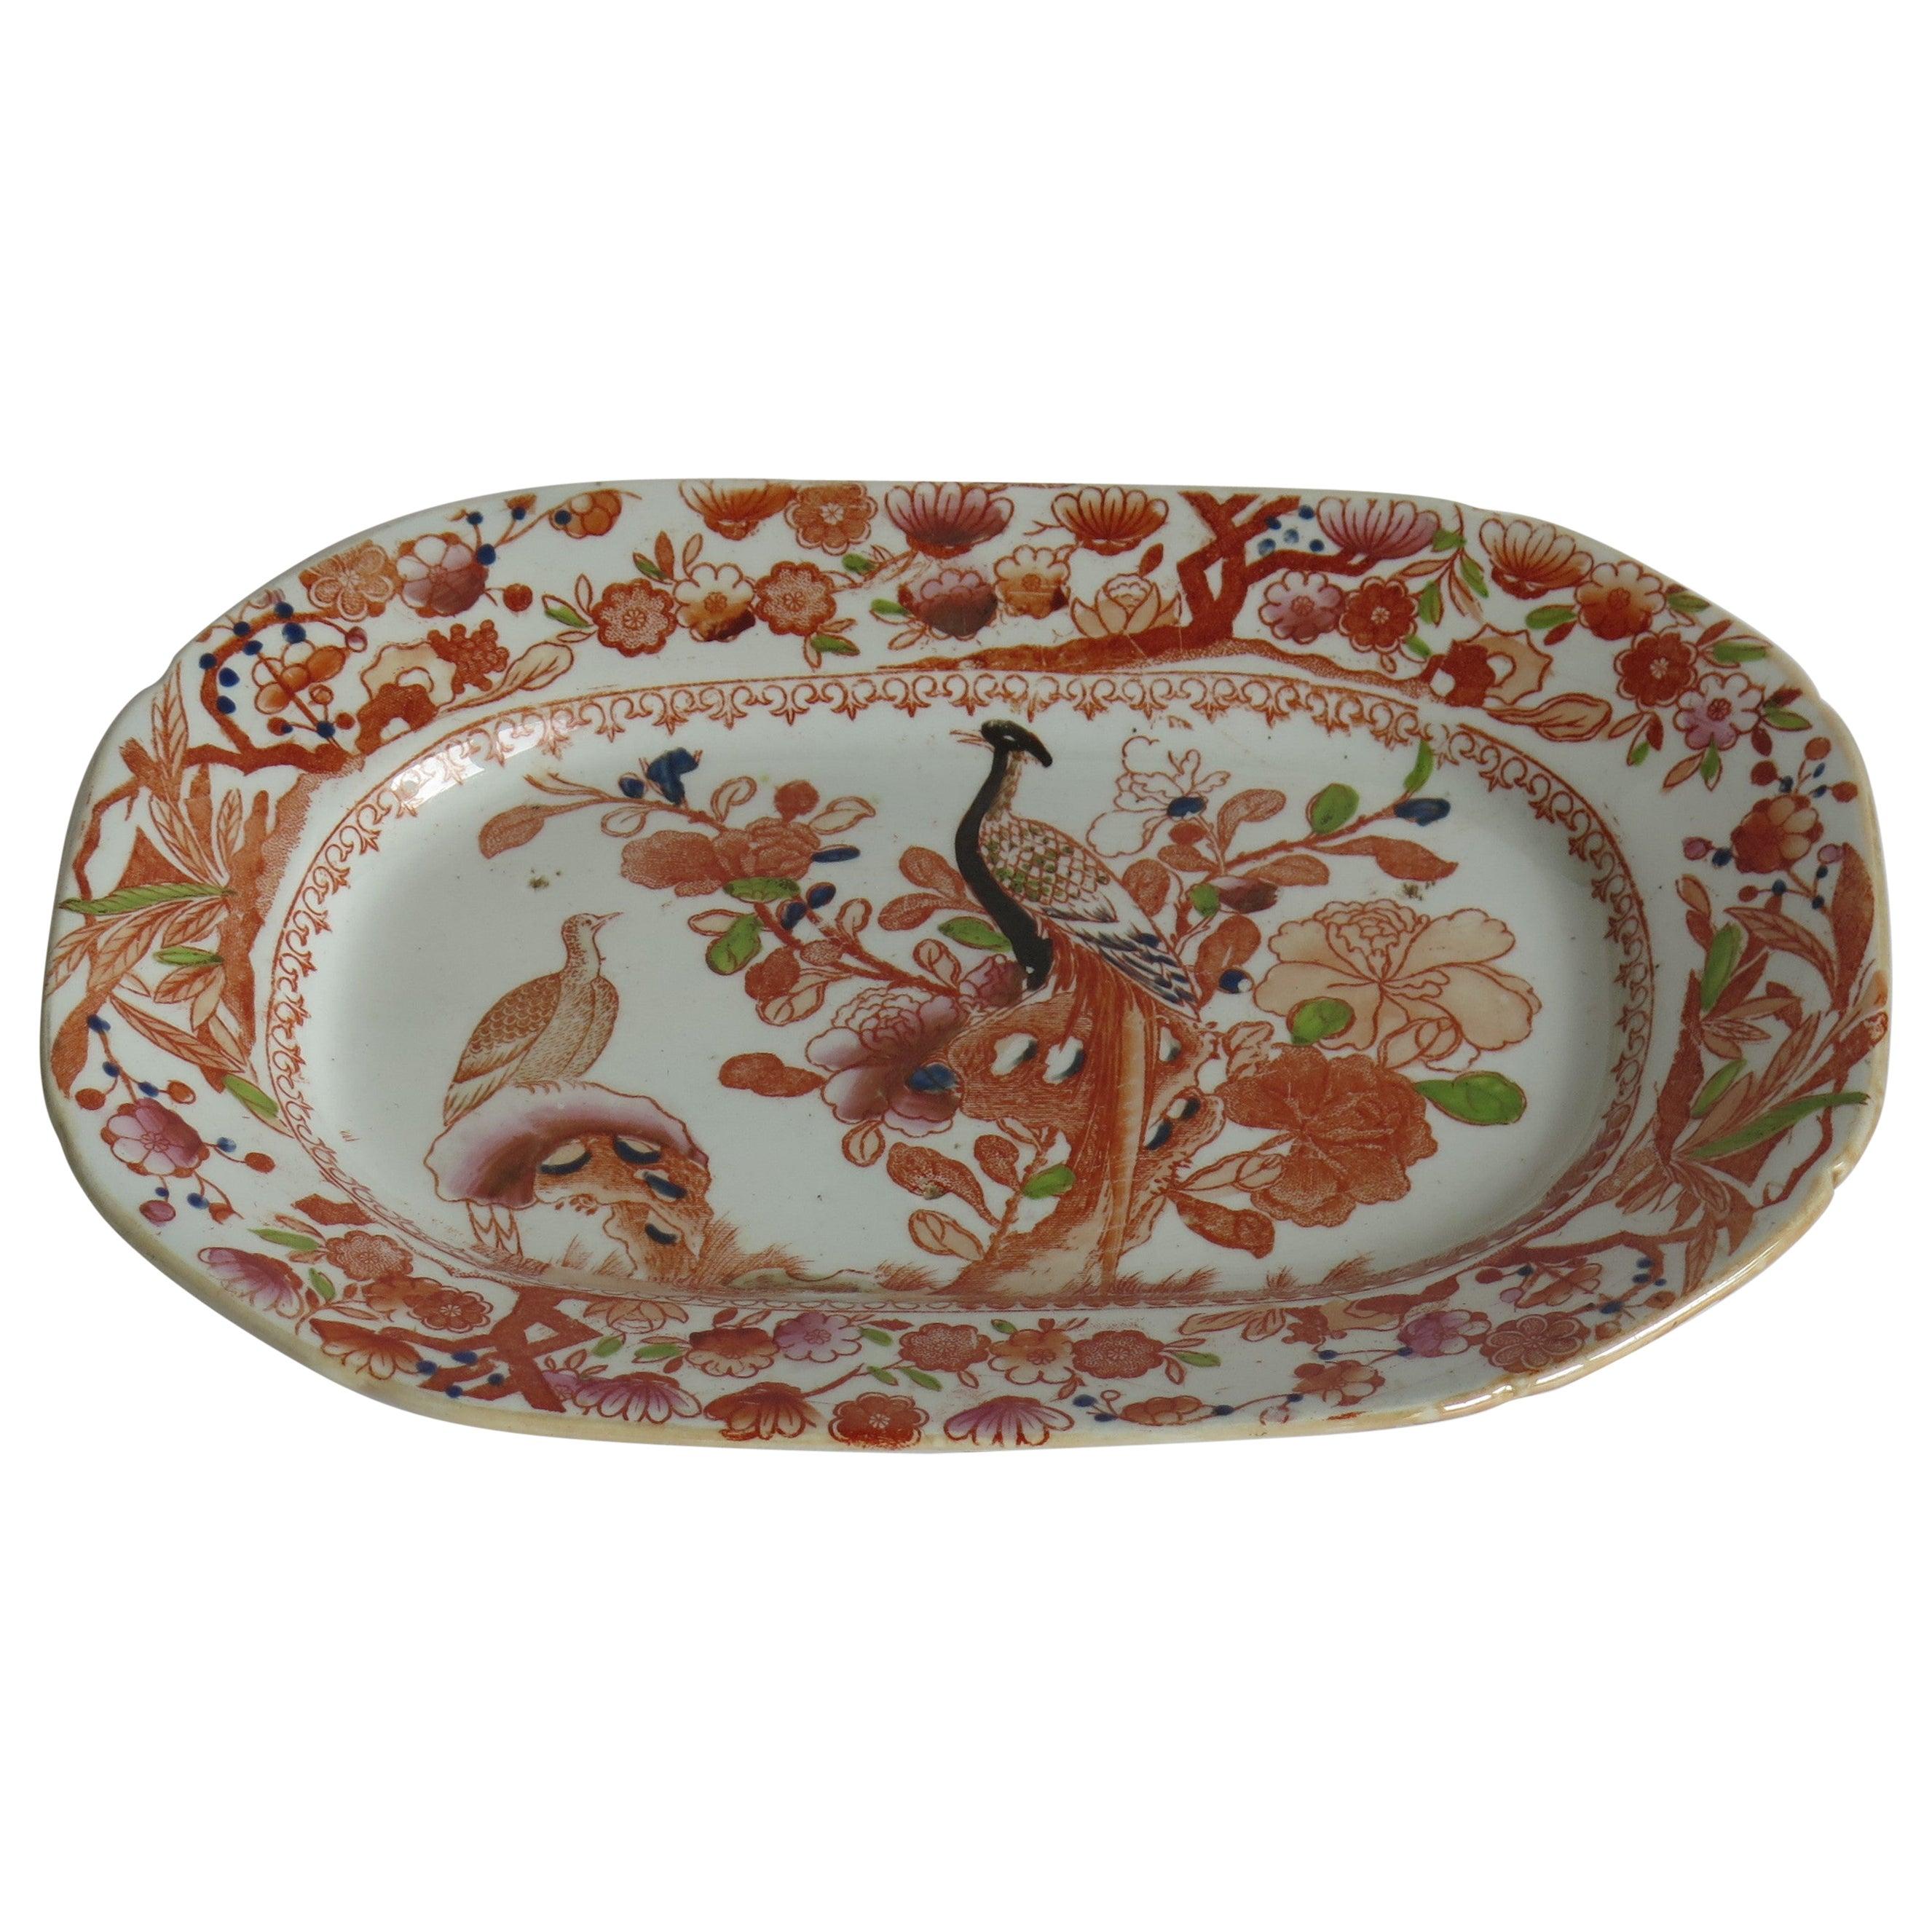 Georgian Mason's Ironstone Platter in Oriental Pheasant Ptn, circa 1818